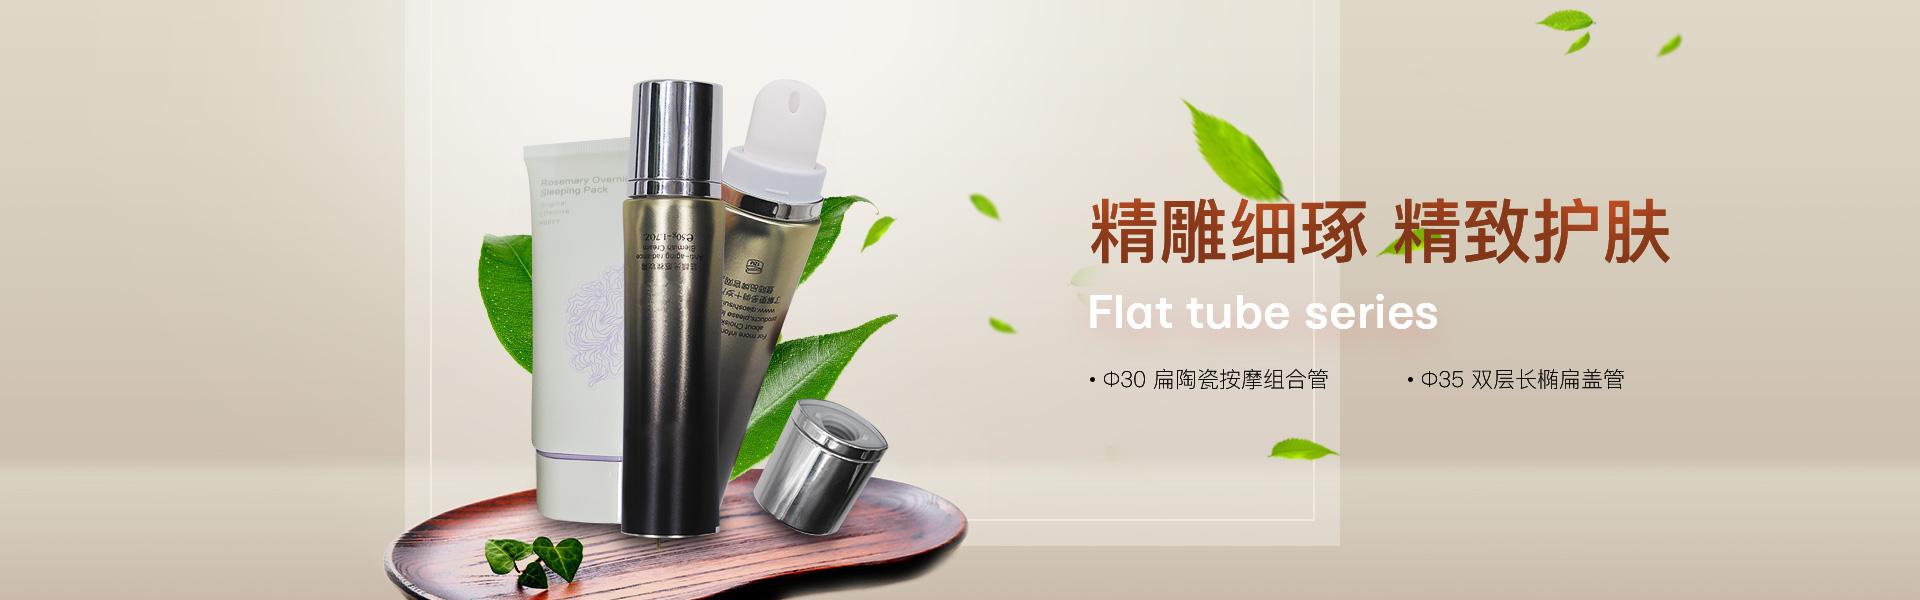 扁管系列 | Flat tube series